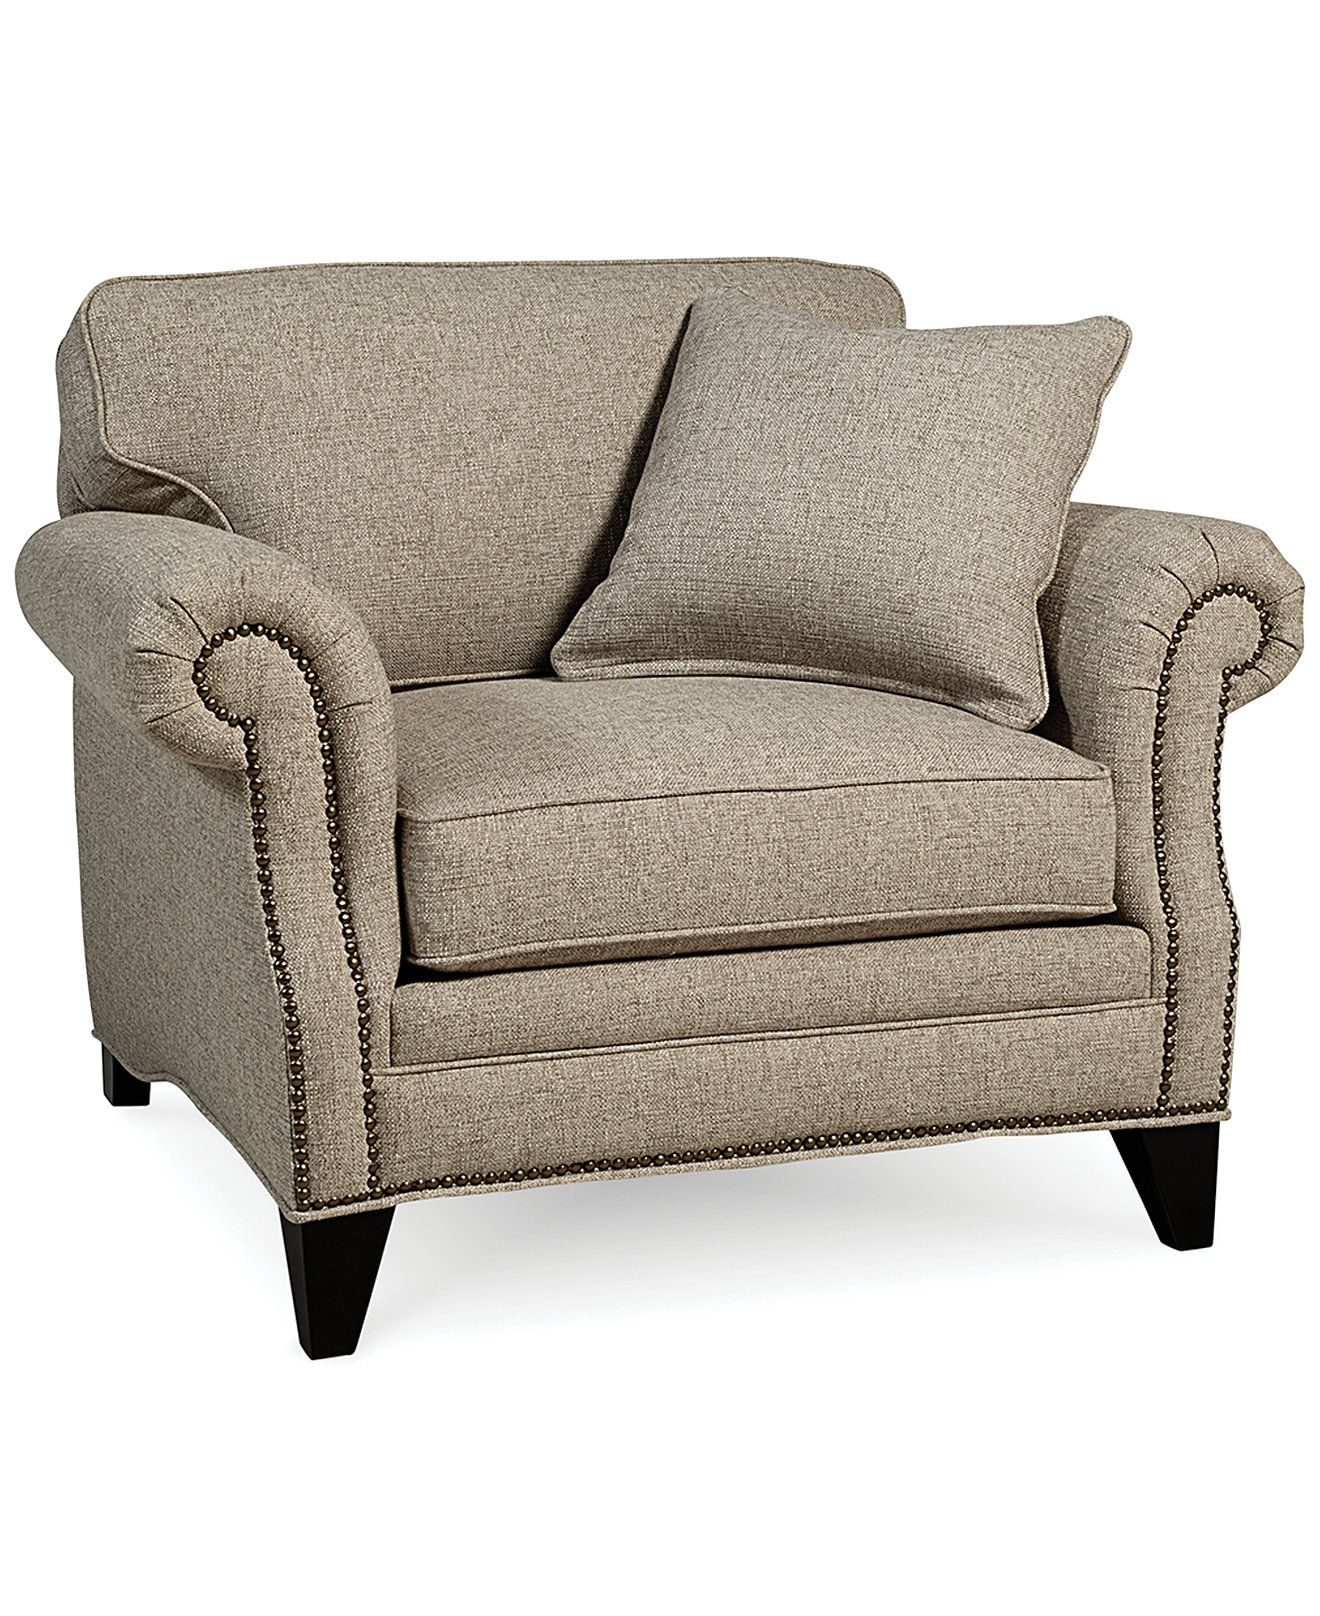 Scarlette Fabric Chair